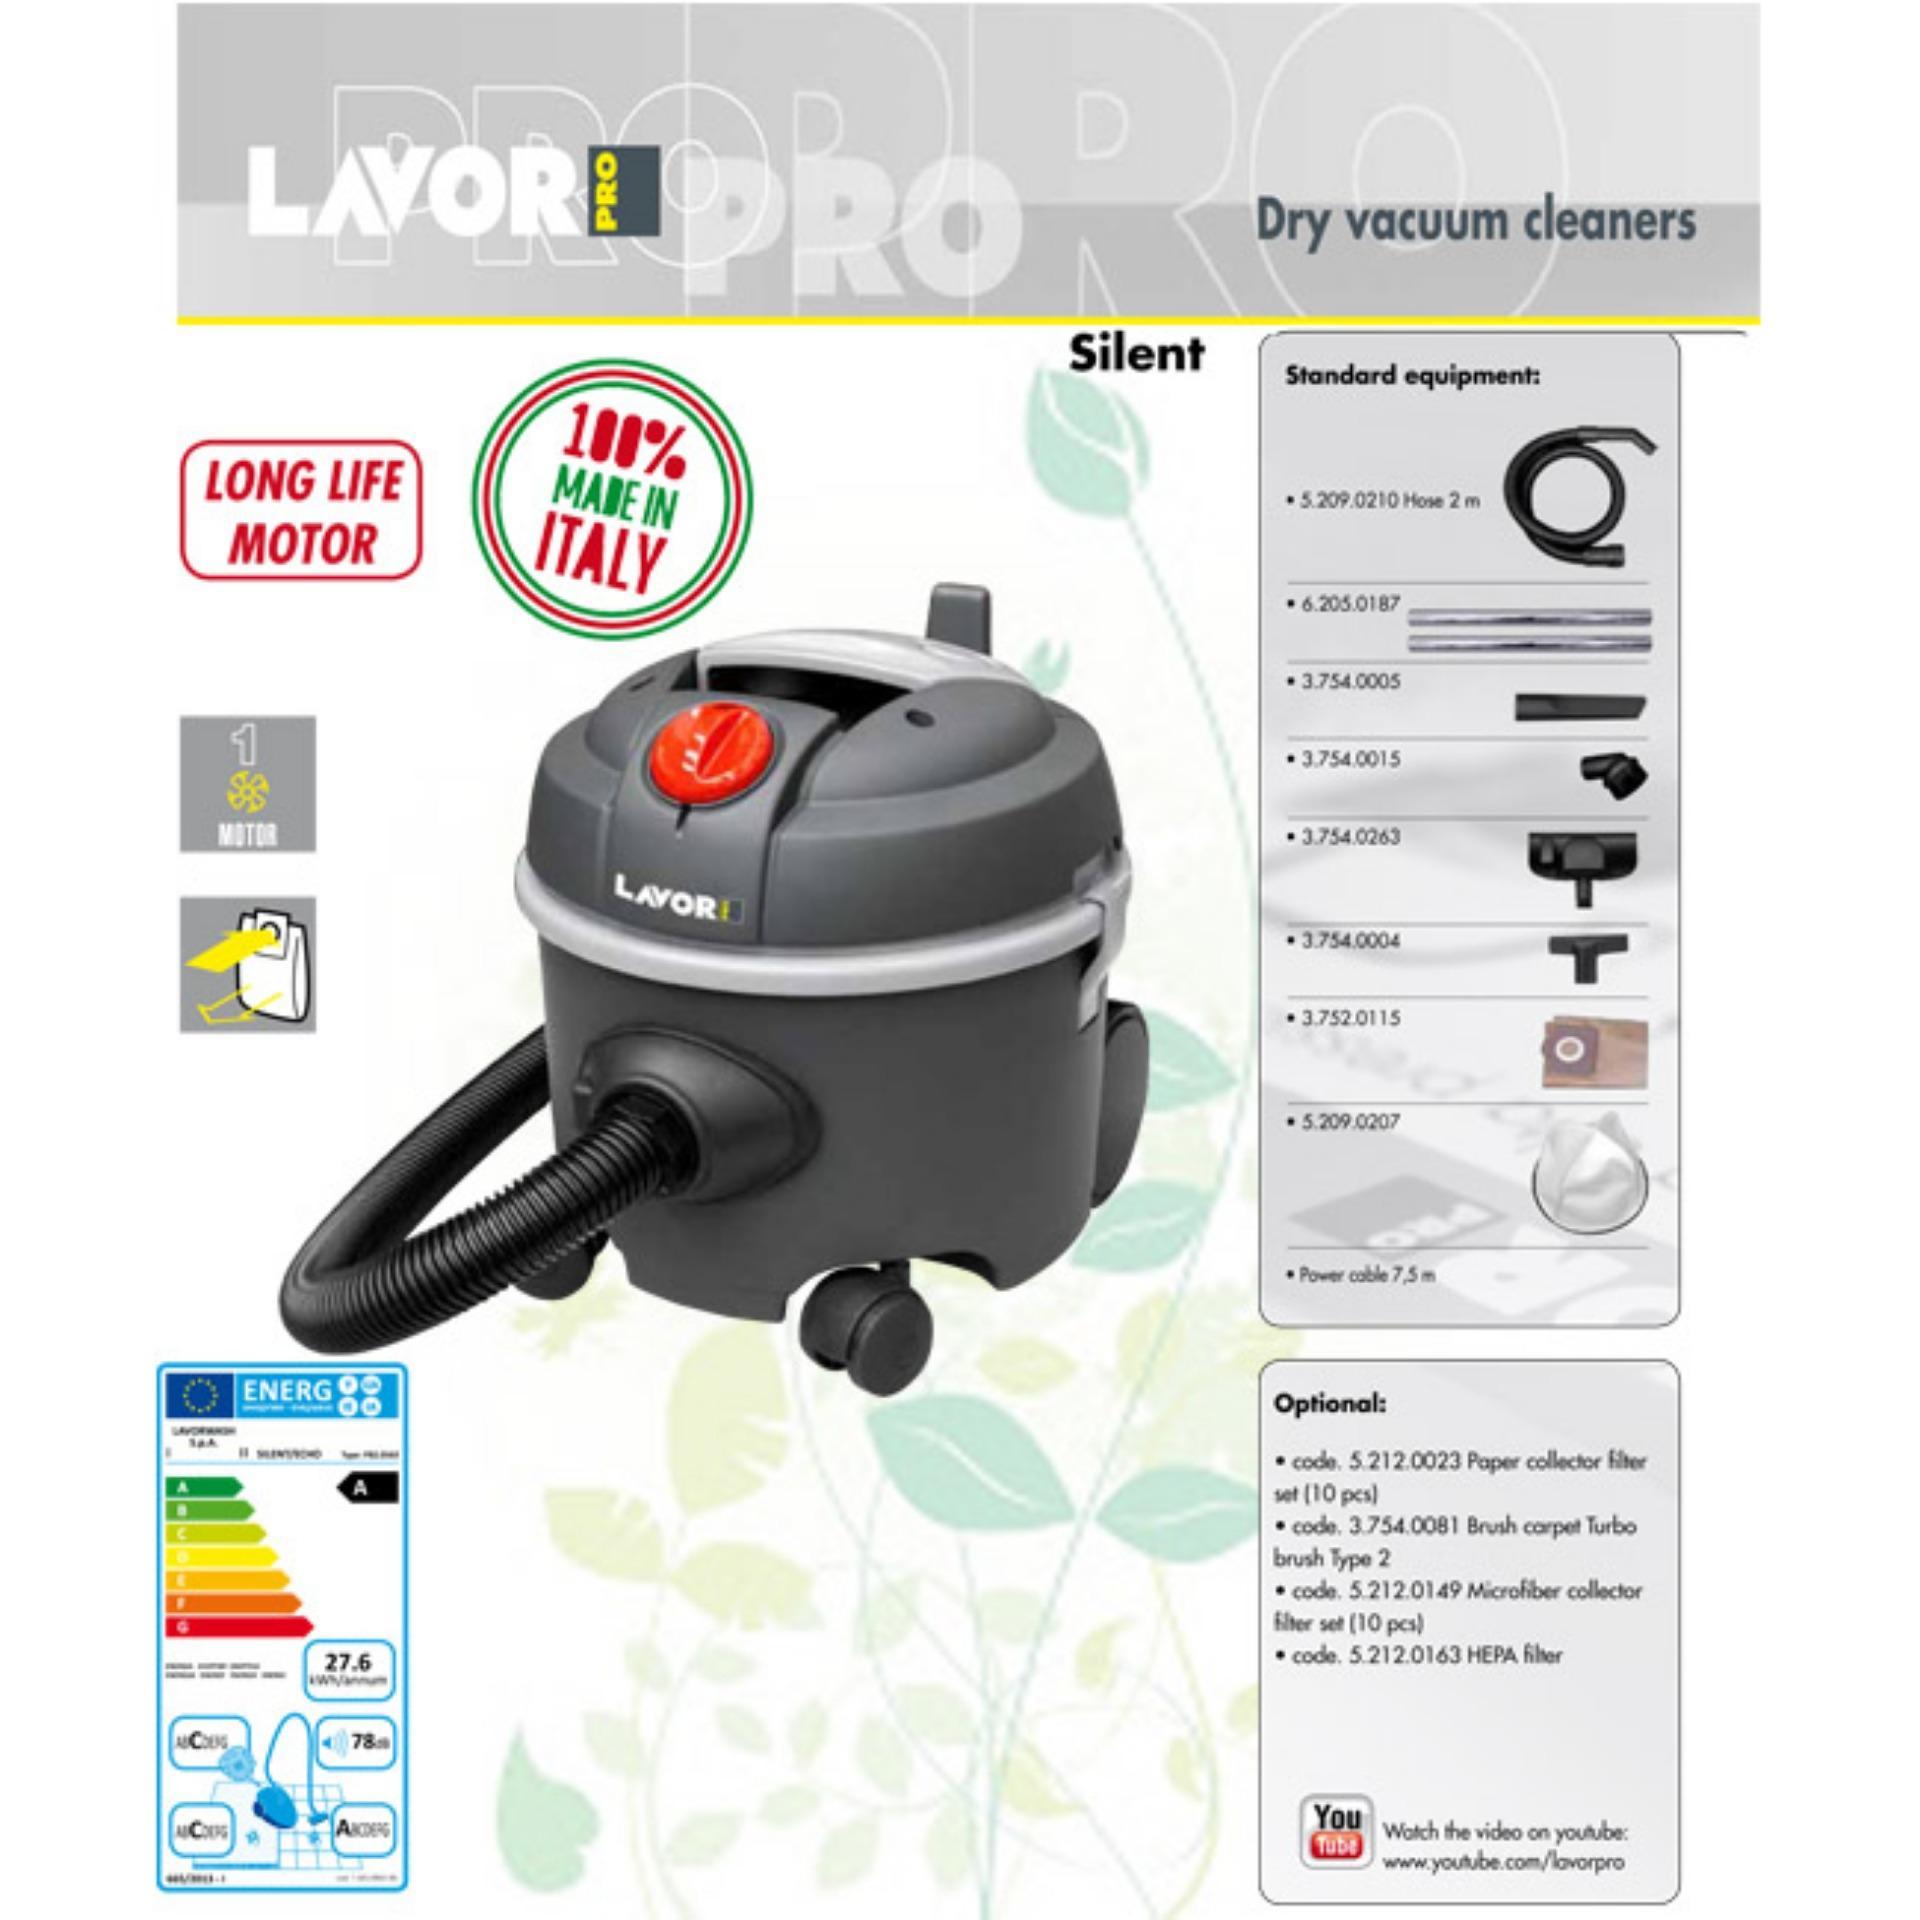 Perbandingan Harga Vacuum Cleaner Silent Lavor Pro Wet Dry Sharp And Ec Cw60 Cheap Online Made In Italy Serba Guna